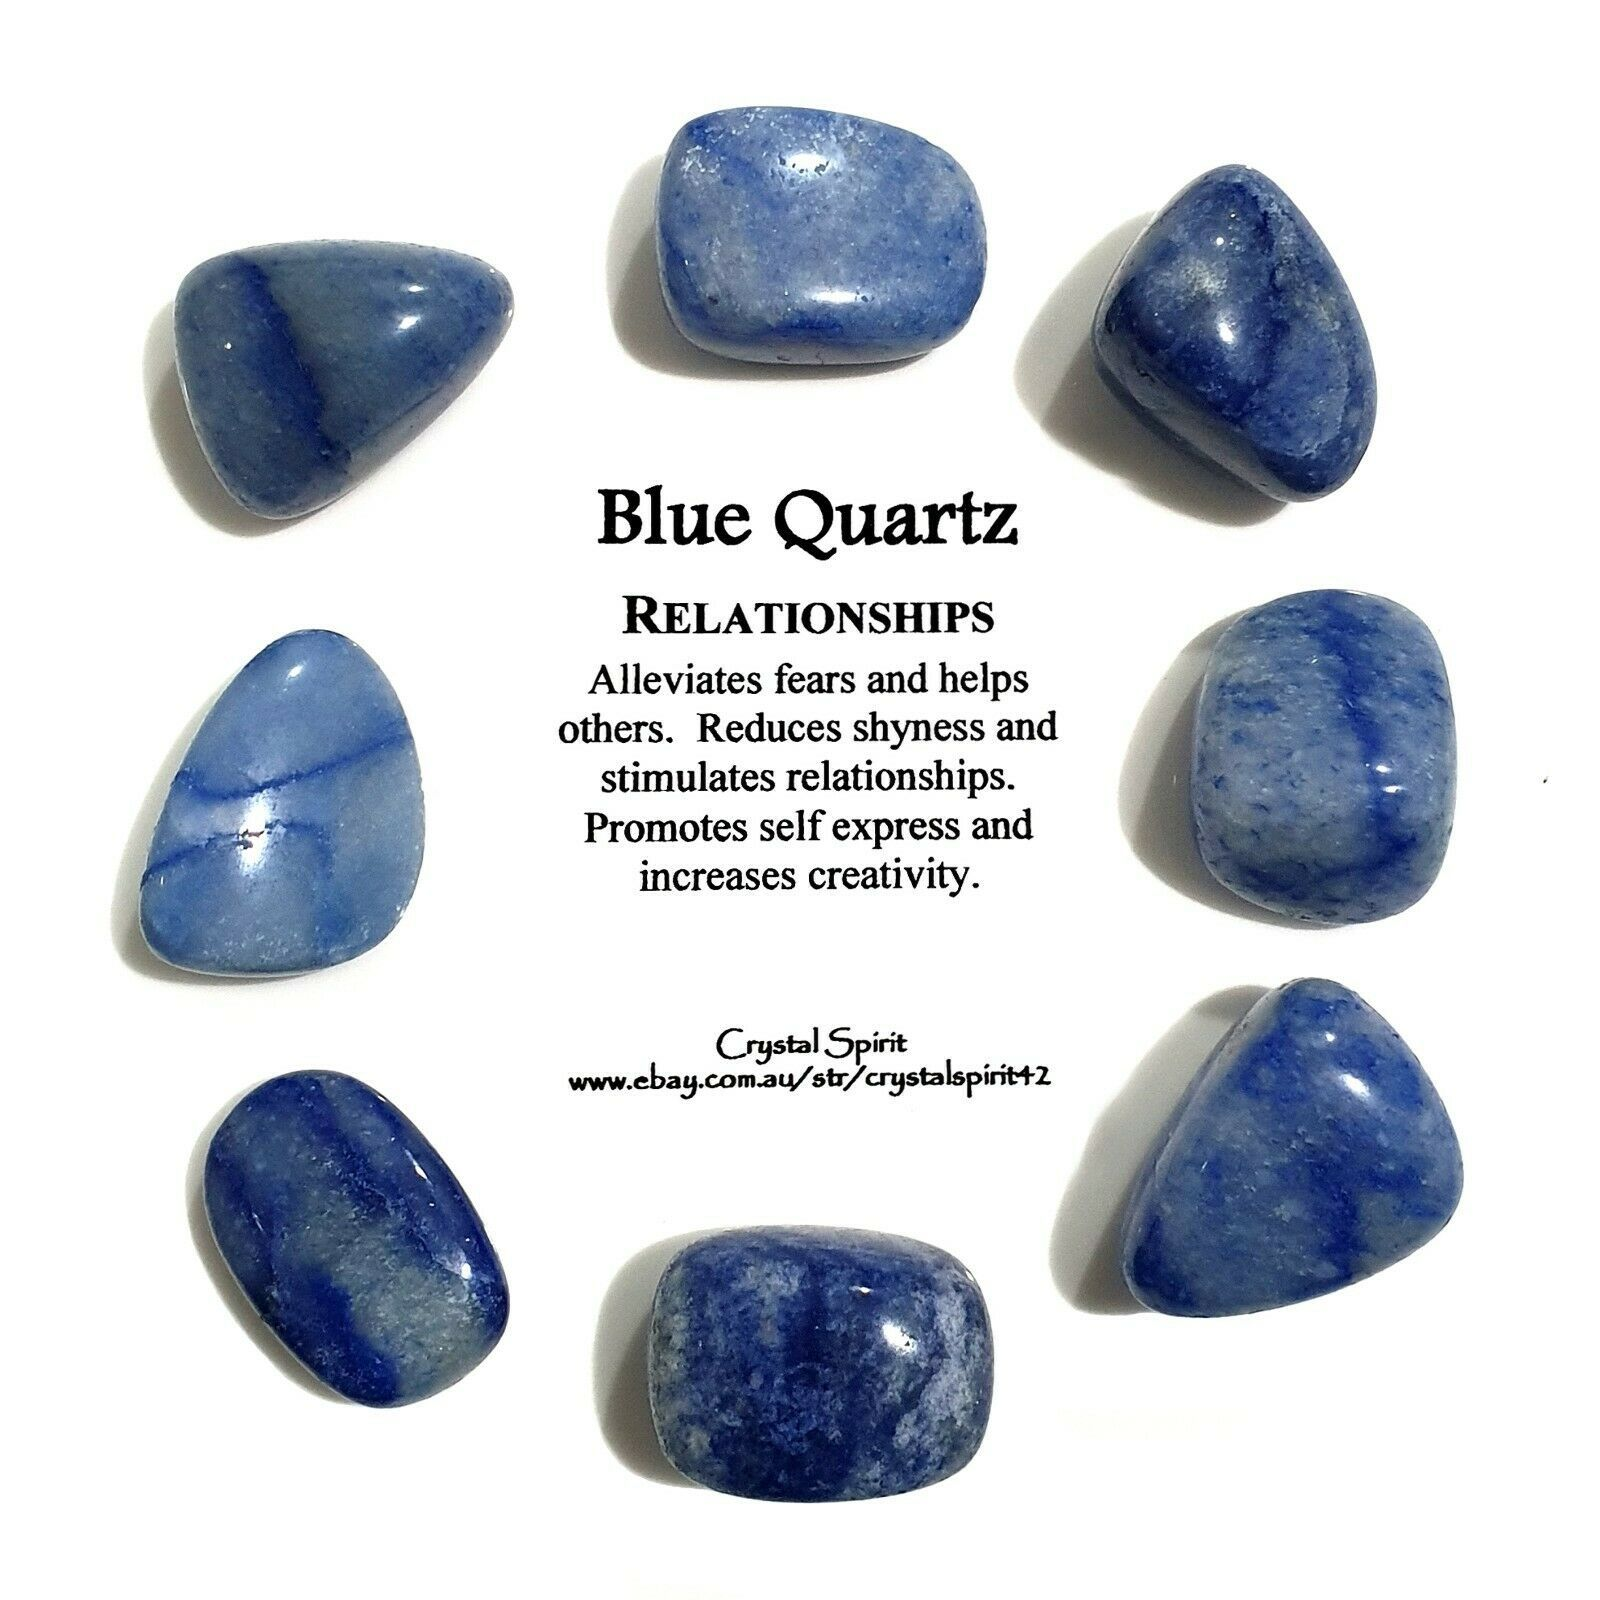 1 Blue Quartz Natural Tumbled Stone Tumble Stone Trusted Seller Blue Quartz Crystal Healing Stones Crystals And Gemstones